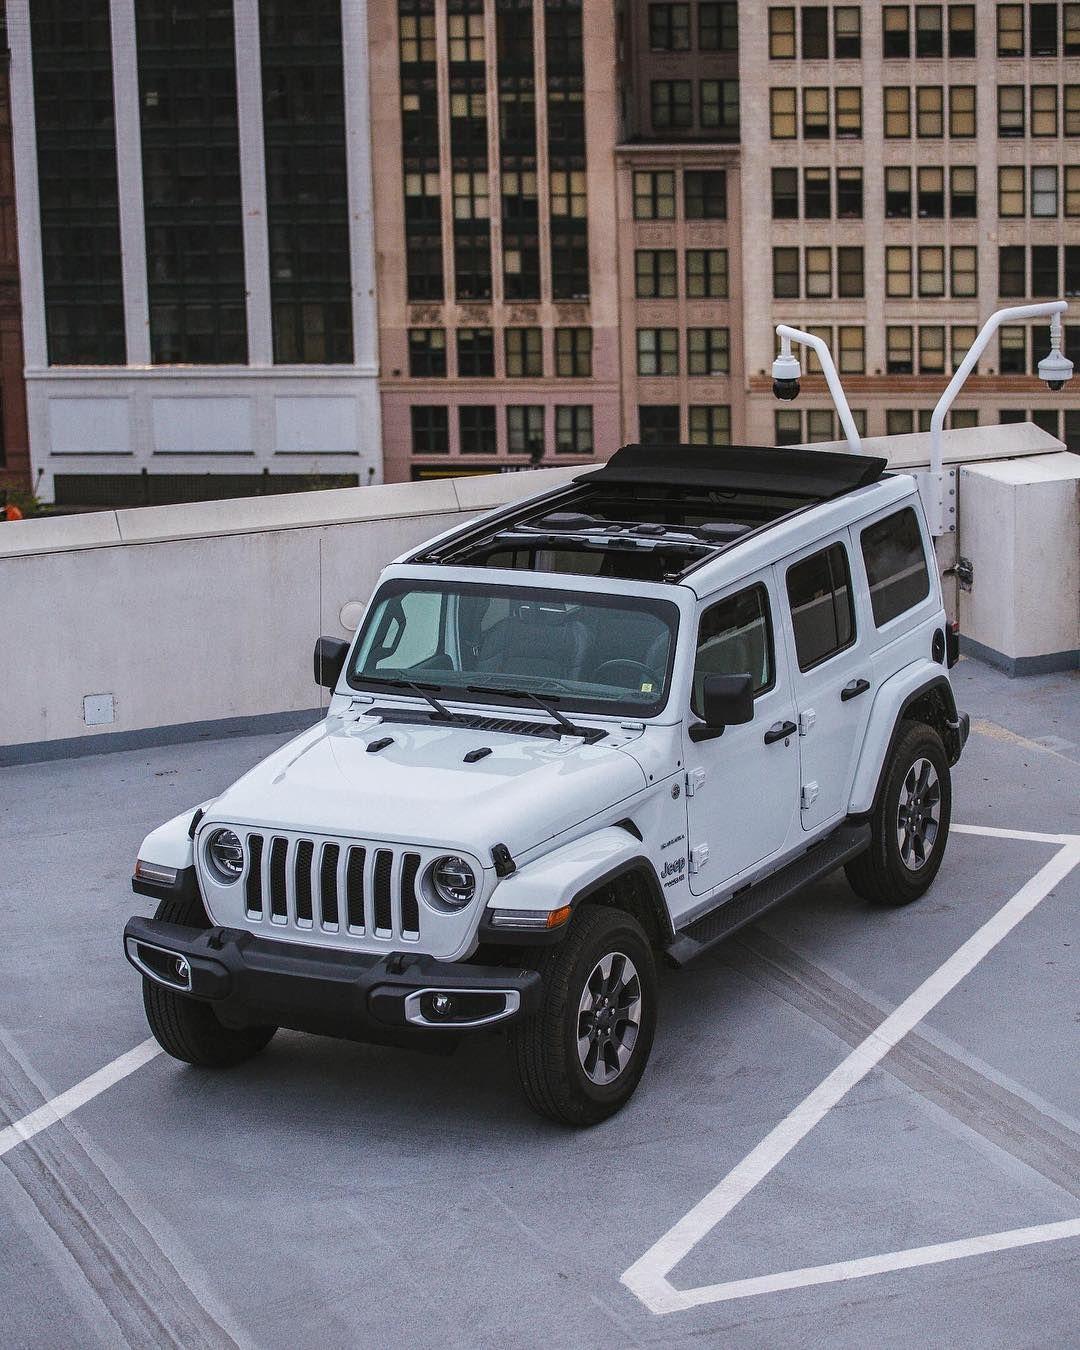 2015 Jeep Wrangler Unlimited Sport Google Search Jeep Wrangler Unlimited 2015 Jeep Wrangler Unlimited Jeep Wrangler